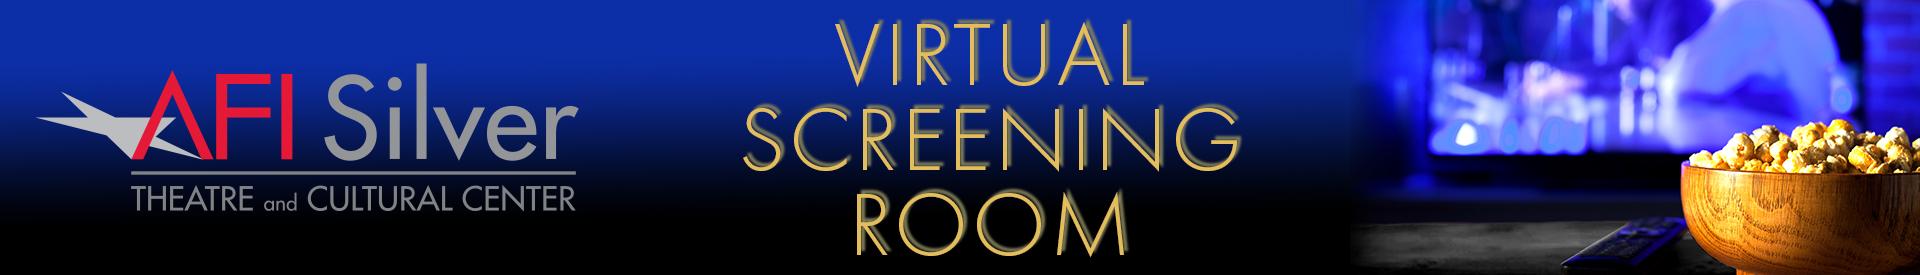 AFI Silver Virtual Screening Room